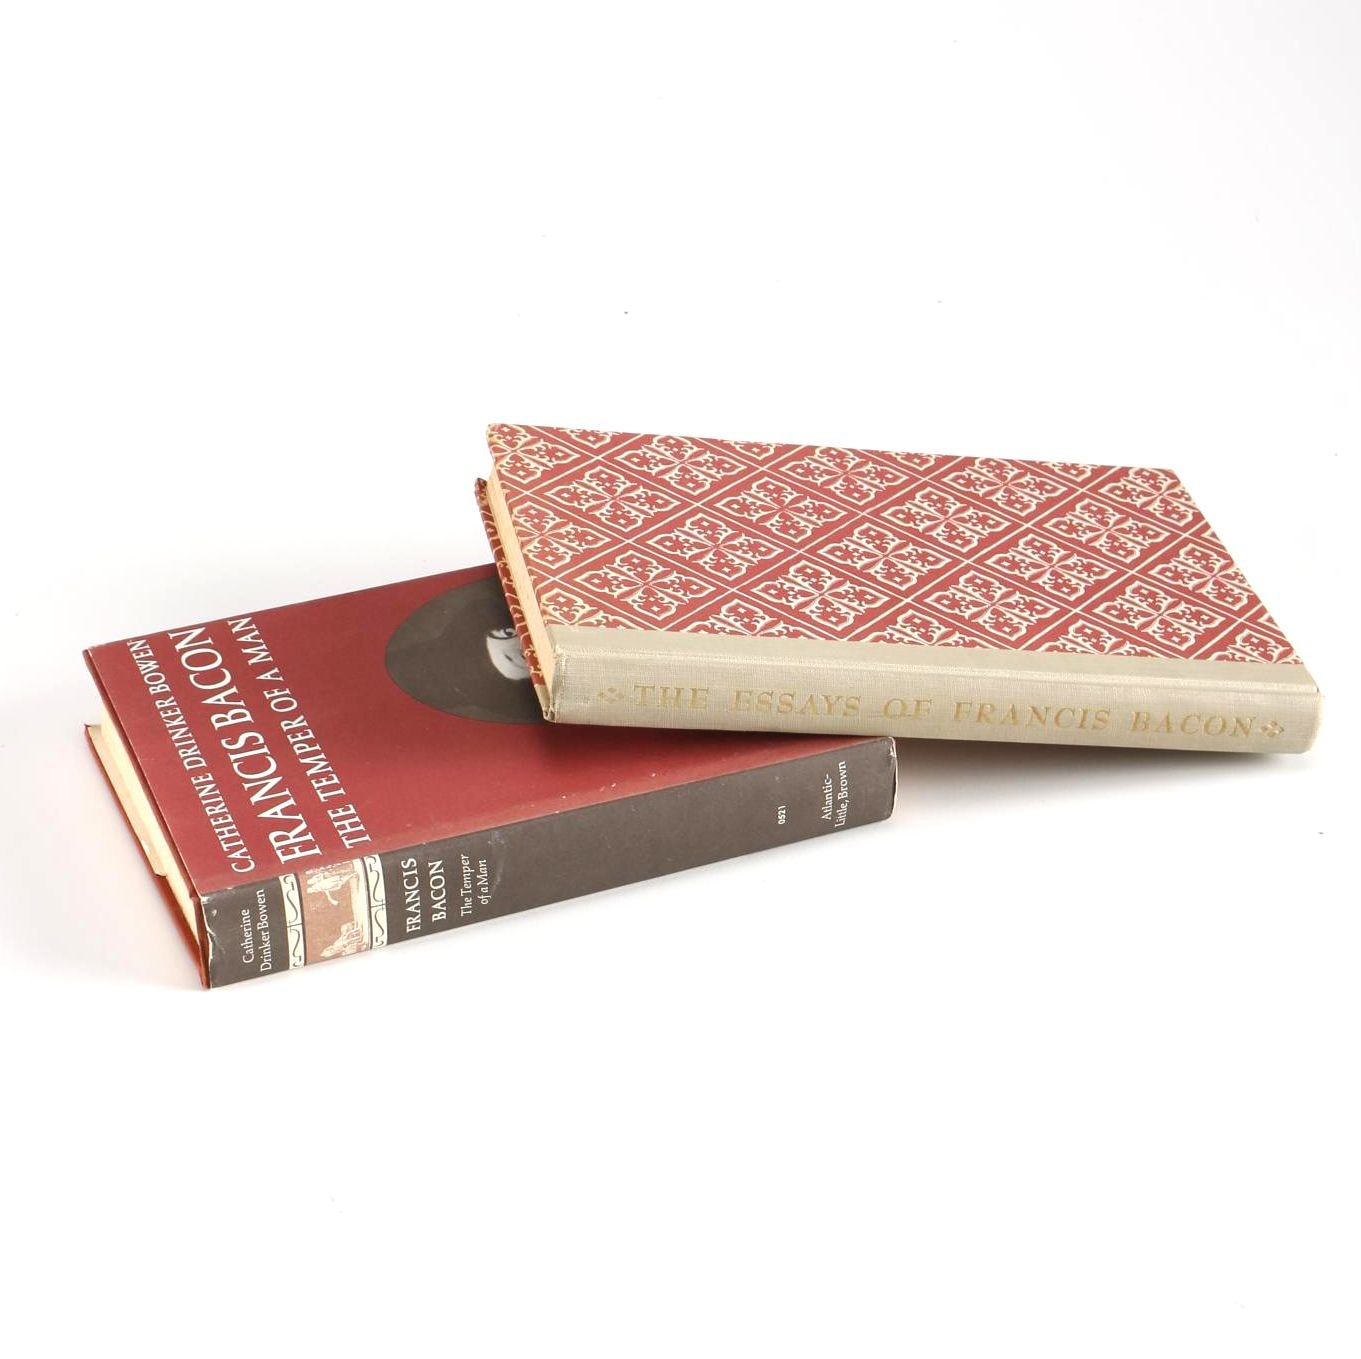 Francis Bacon Books